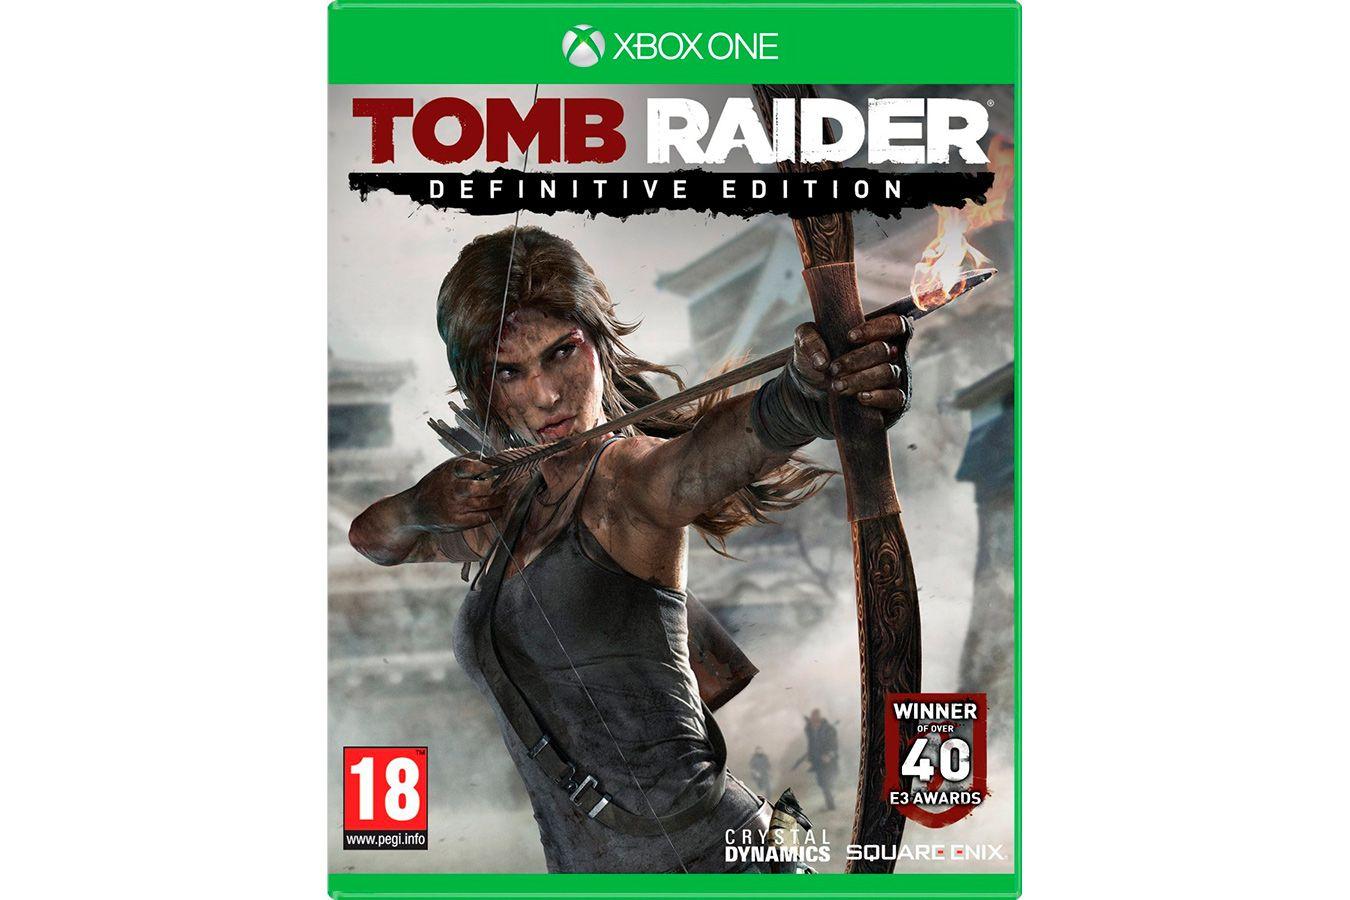 Xbox One Tomb Raider подарочная версия  изображение 2